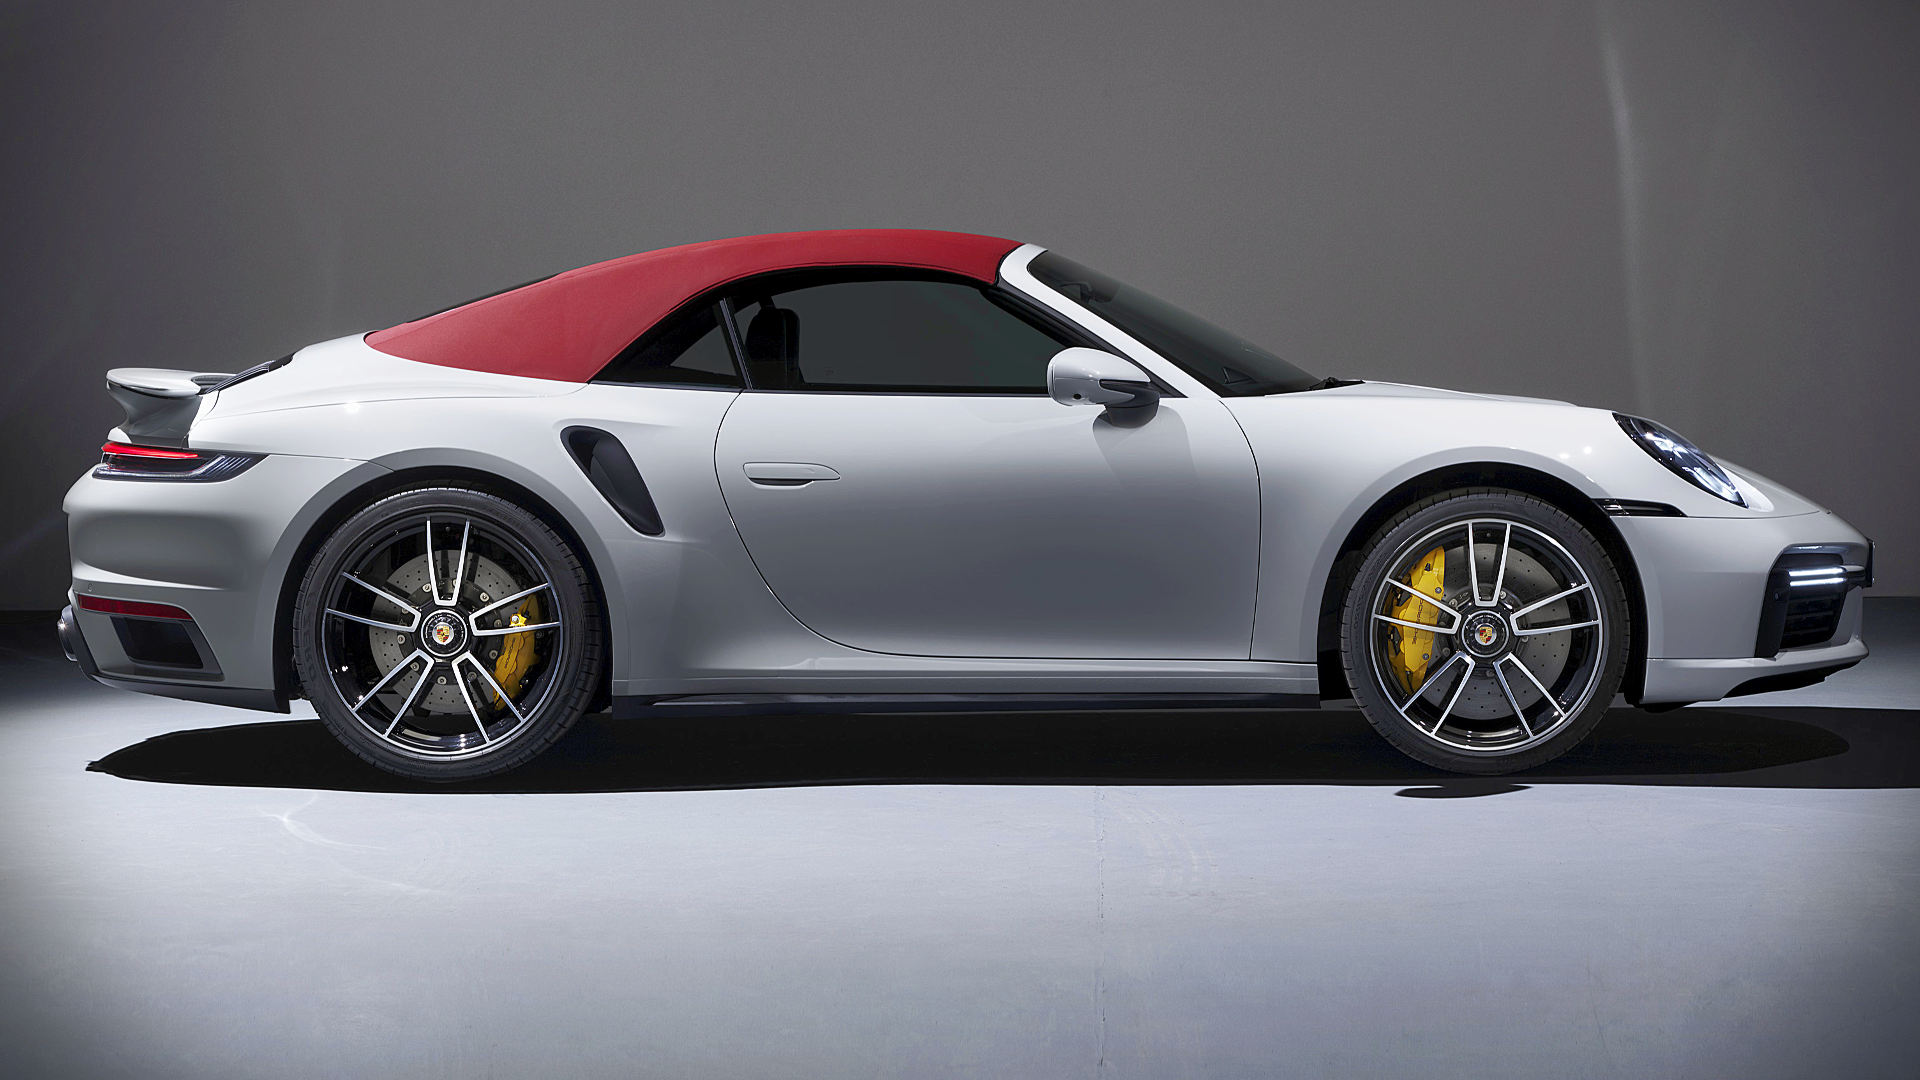 2021 Porsche 911 Turbo S Cabriolet Wallpaper Hd